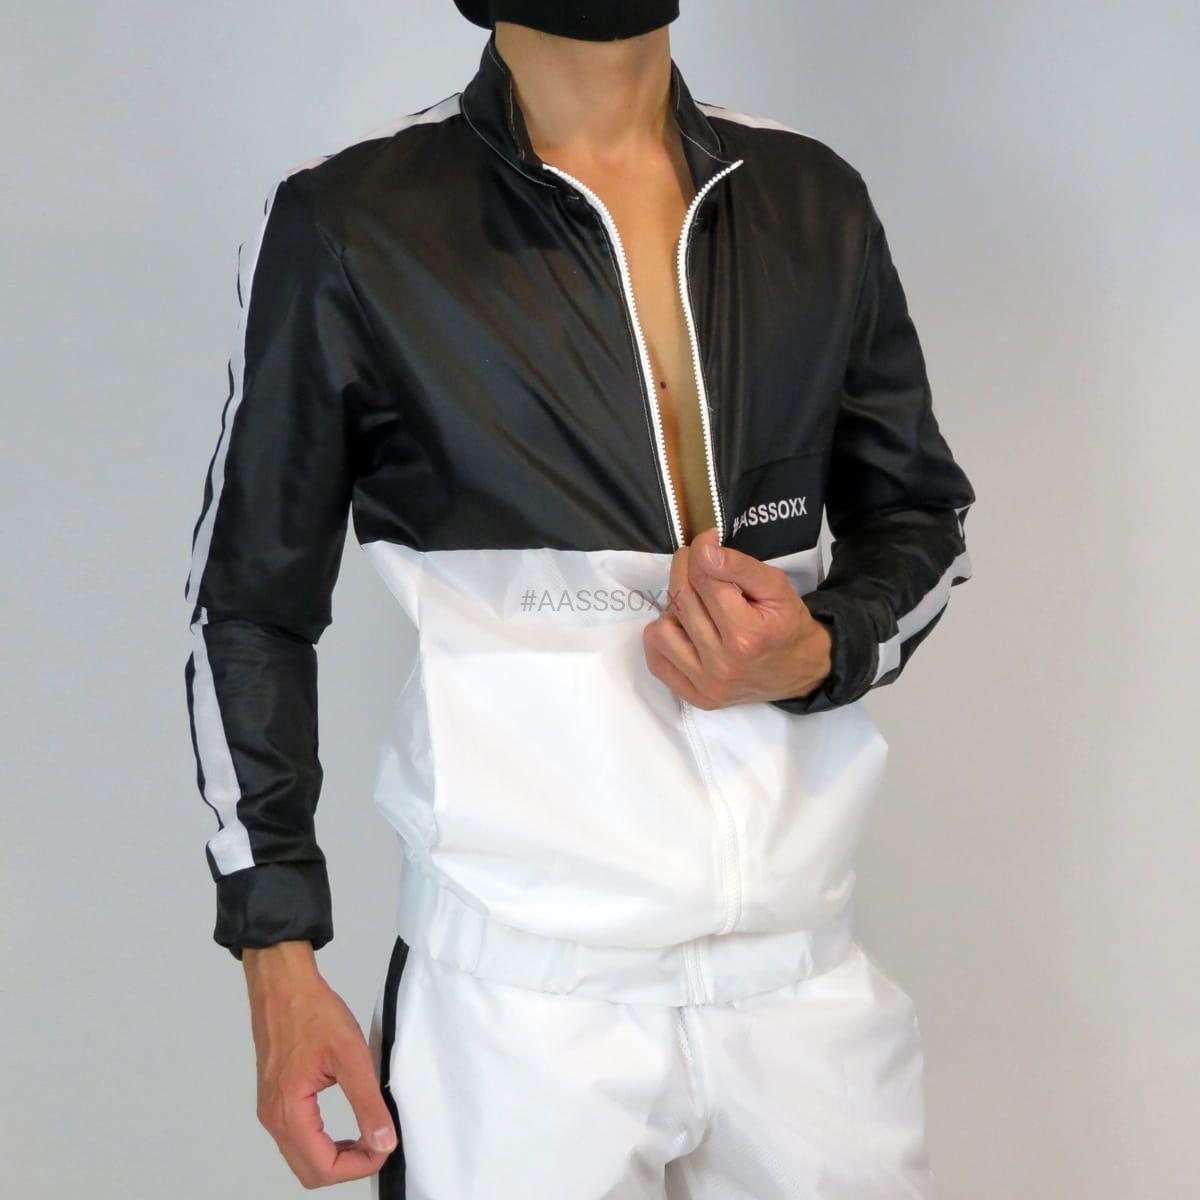 Football Jacket Black And White